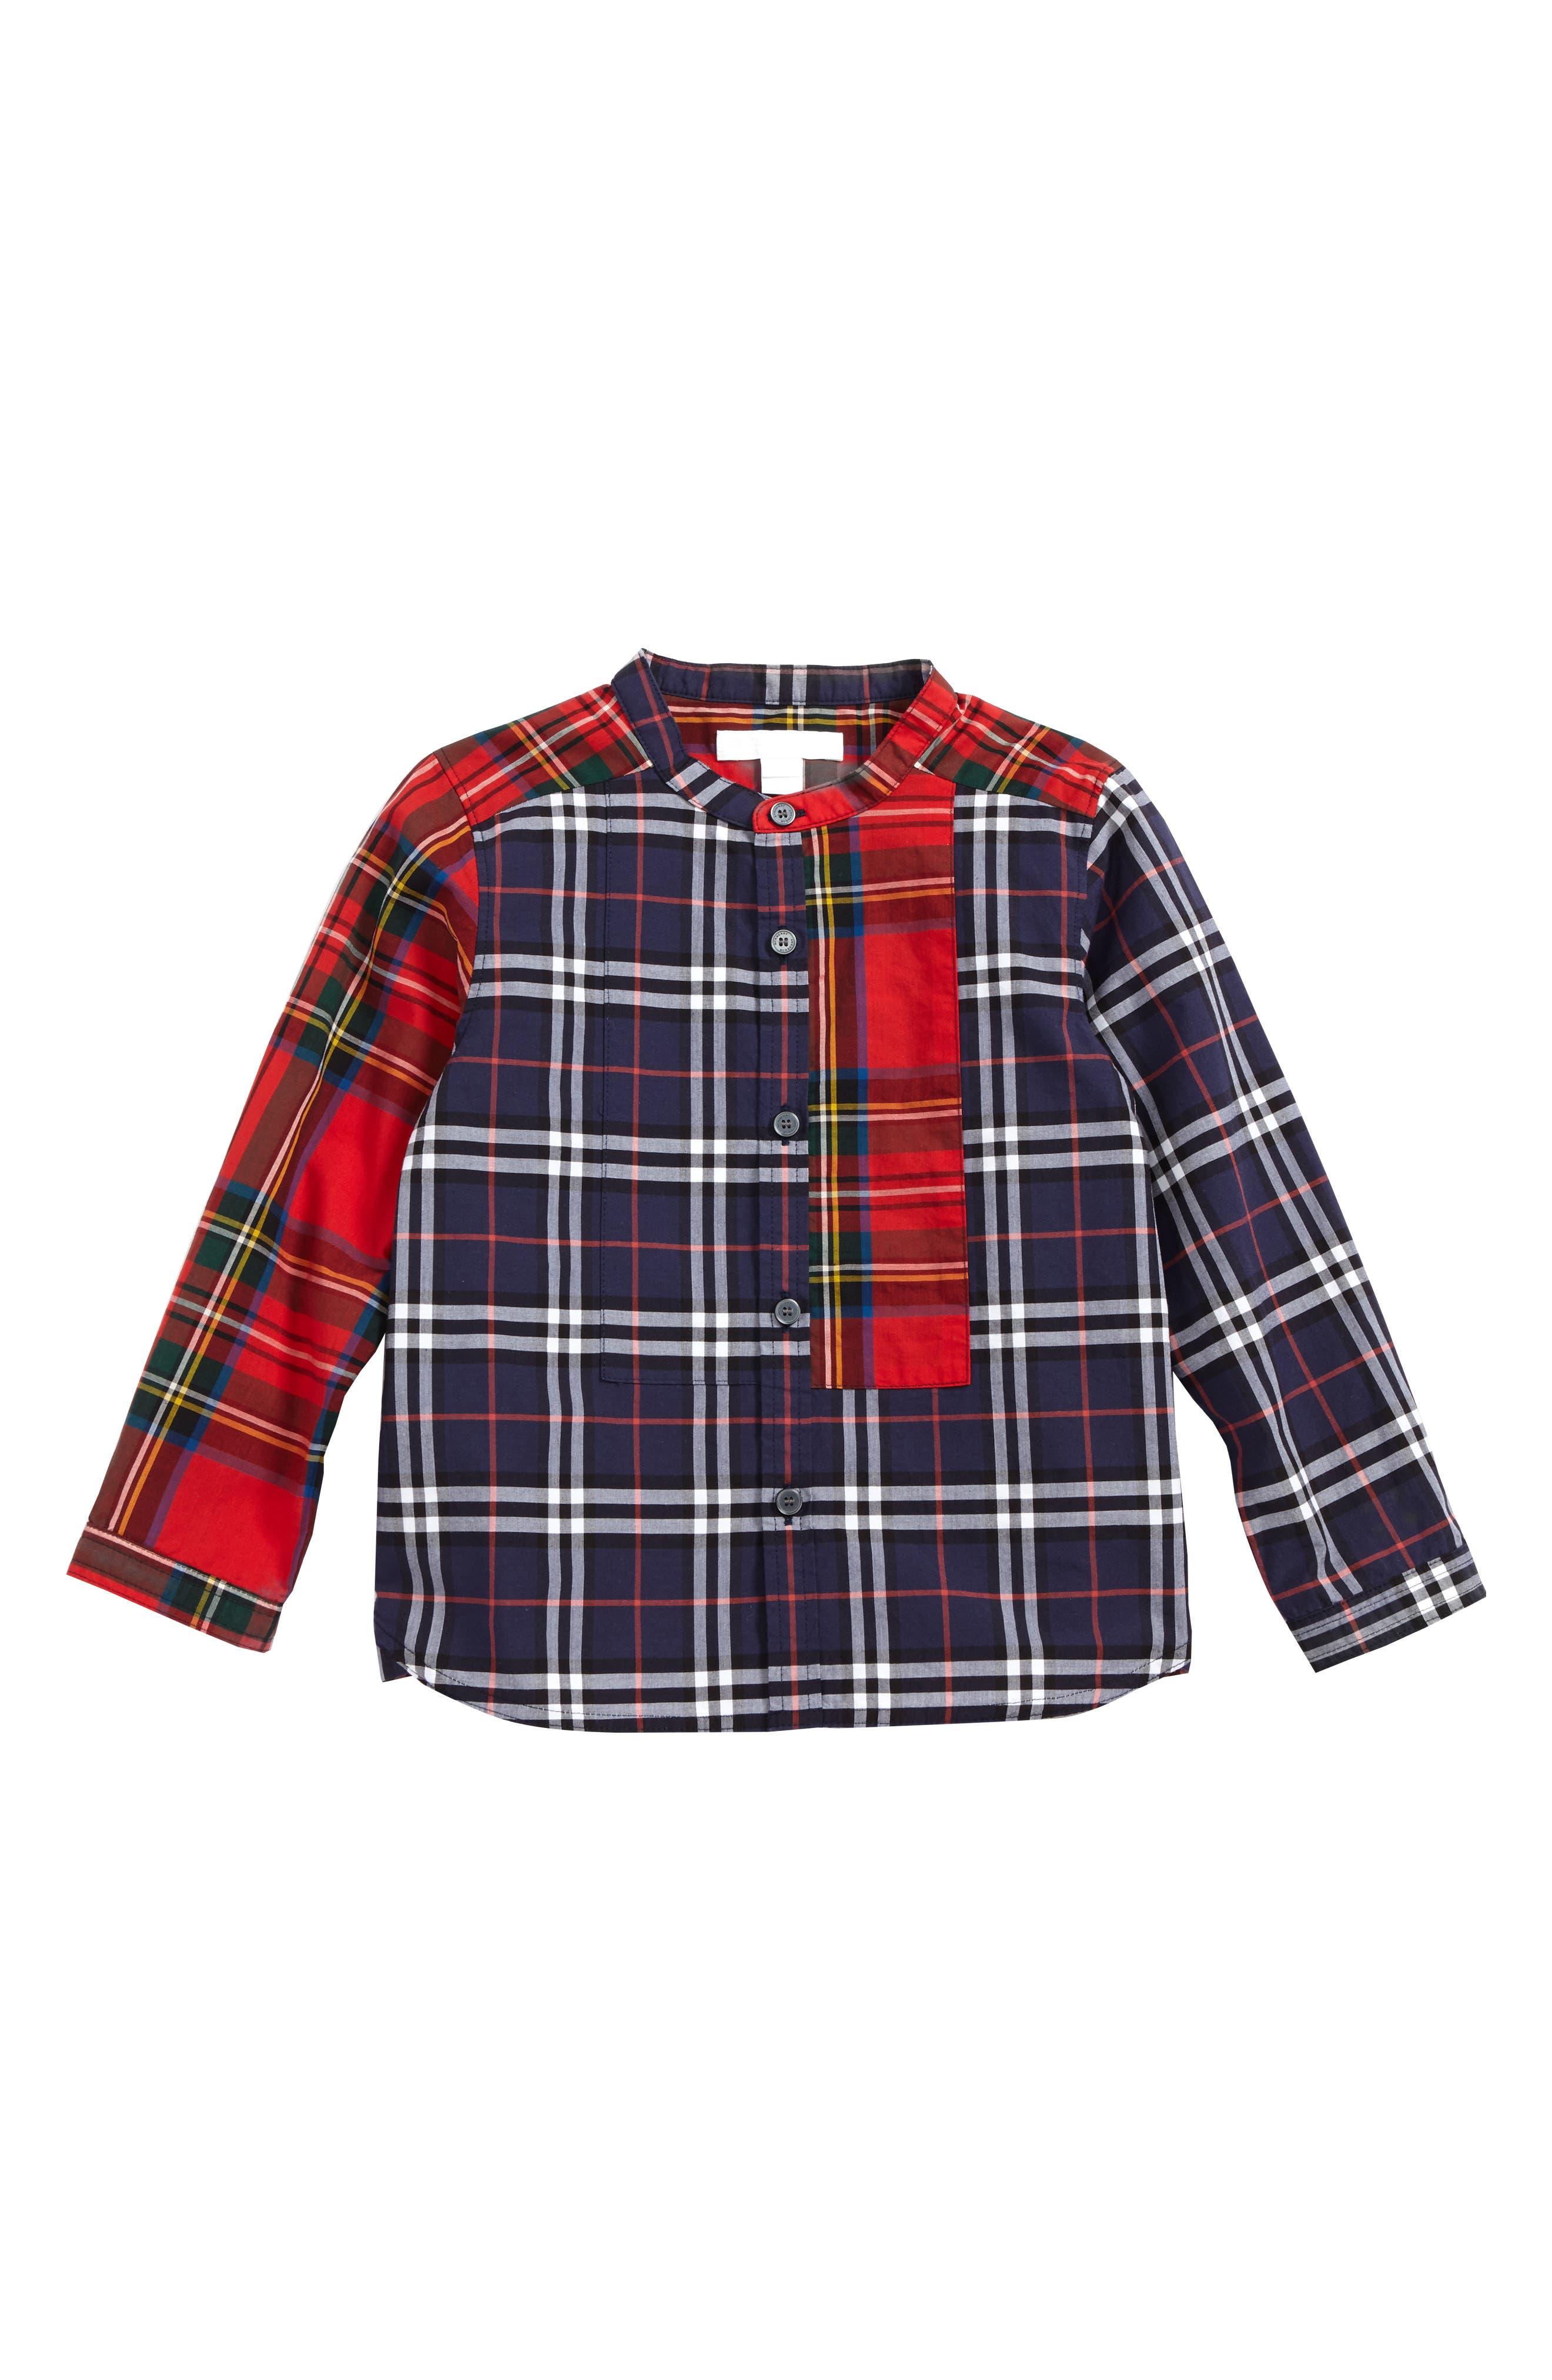 Alternate Image 1 Selected - Burberry Argus Check Print Woven Shirt (Baby Boys)